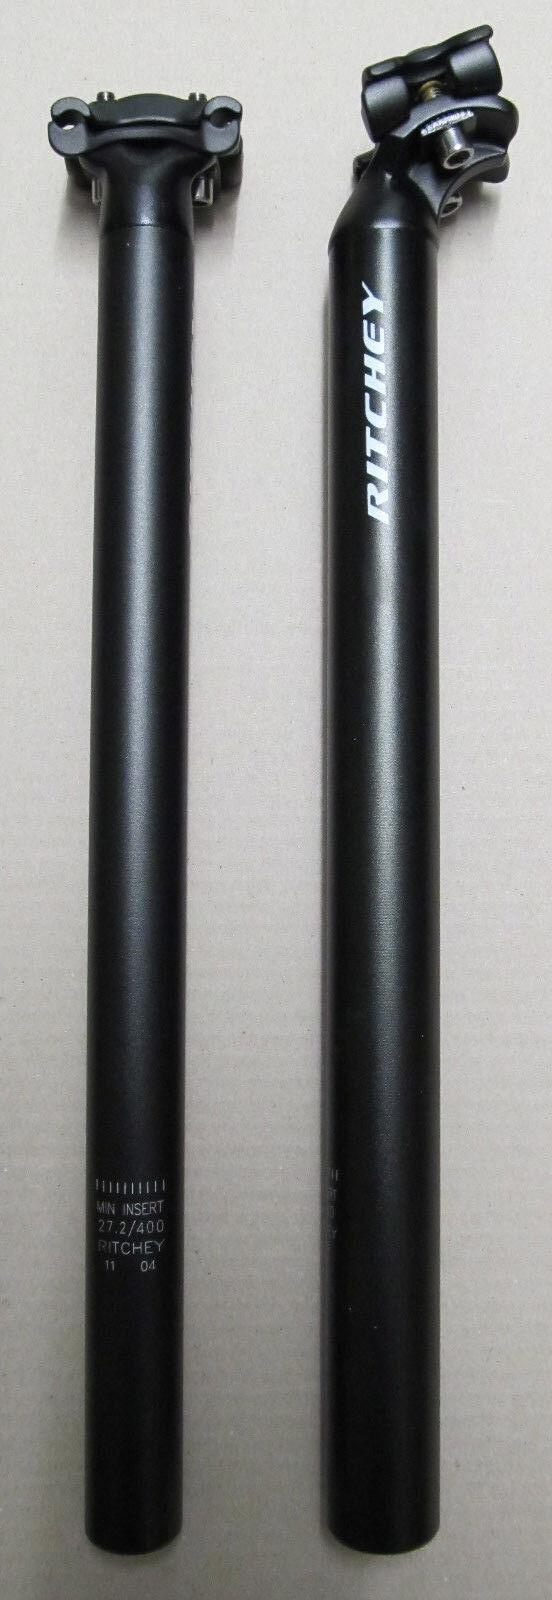 Ritchey Logica 2-Bolt Reggisella 31,6mm 400mm Nuovo 316gramm